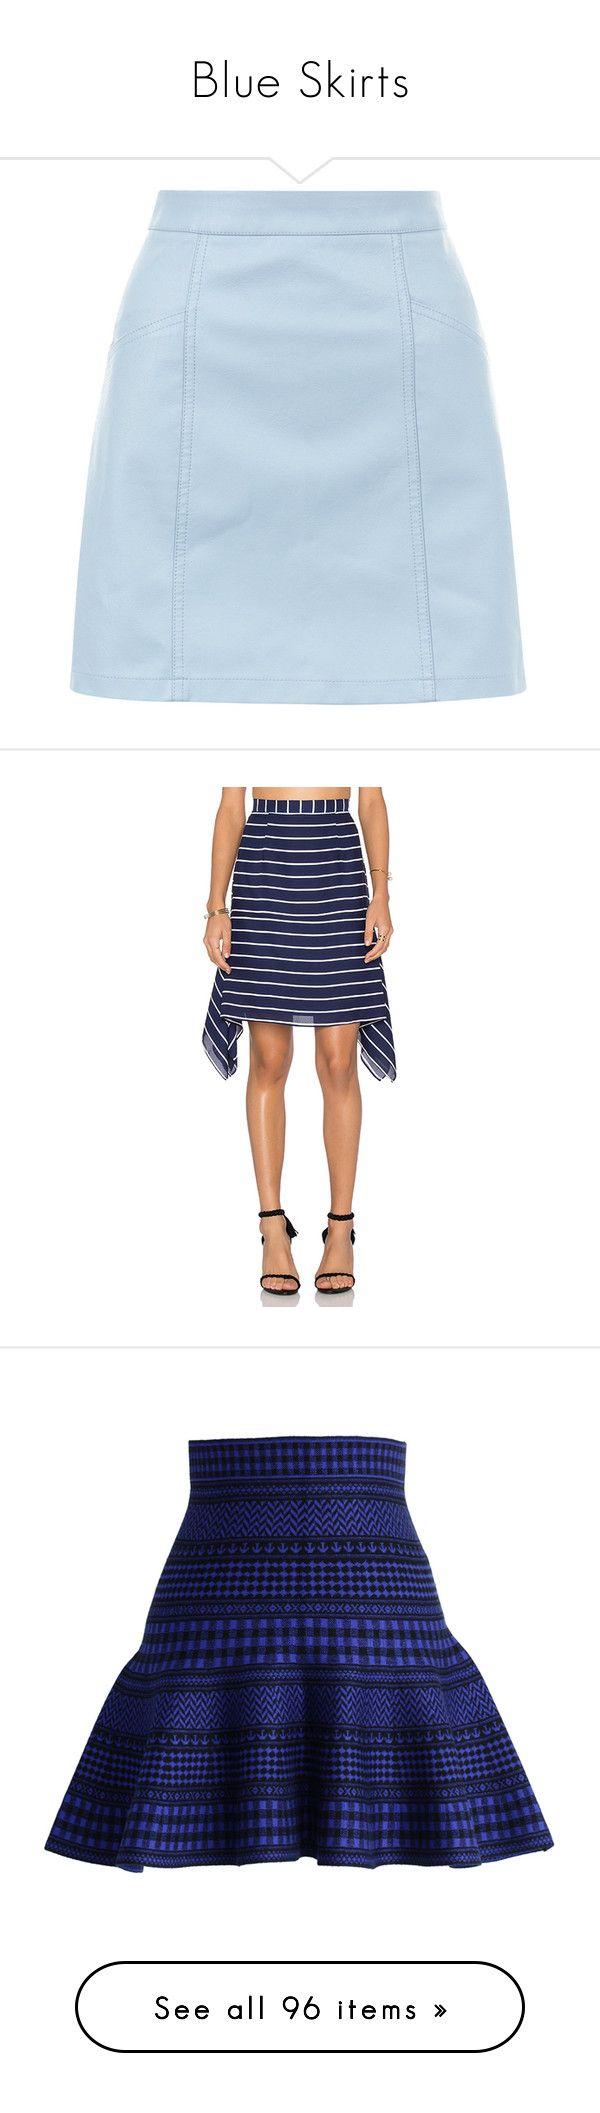 """Blue Skirts"" by kikikoji ❤ liked on Polyvore featuring skirts, mini skirts, bottoms, pale blue, short blue skirt, mini skirt, pale blue skirt, blue mini skirt, short skirts and shona joy"